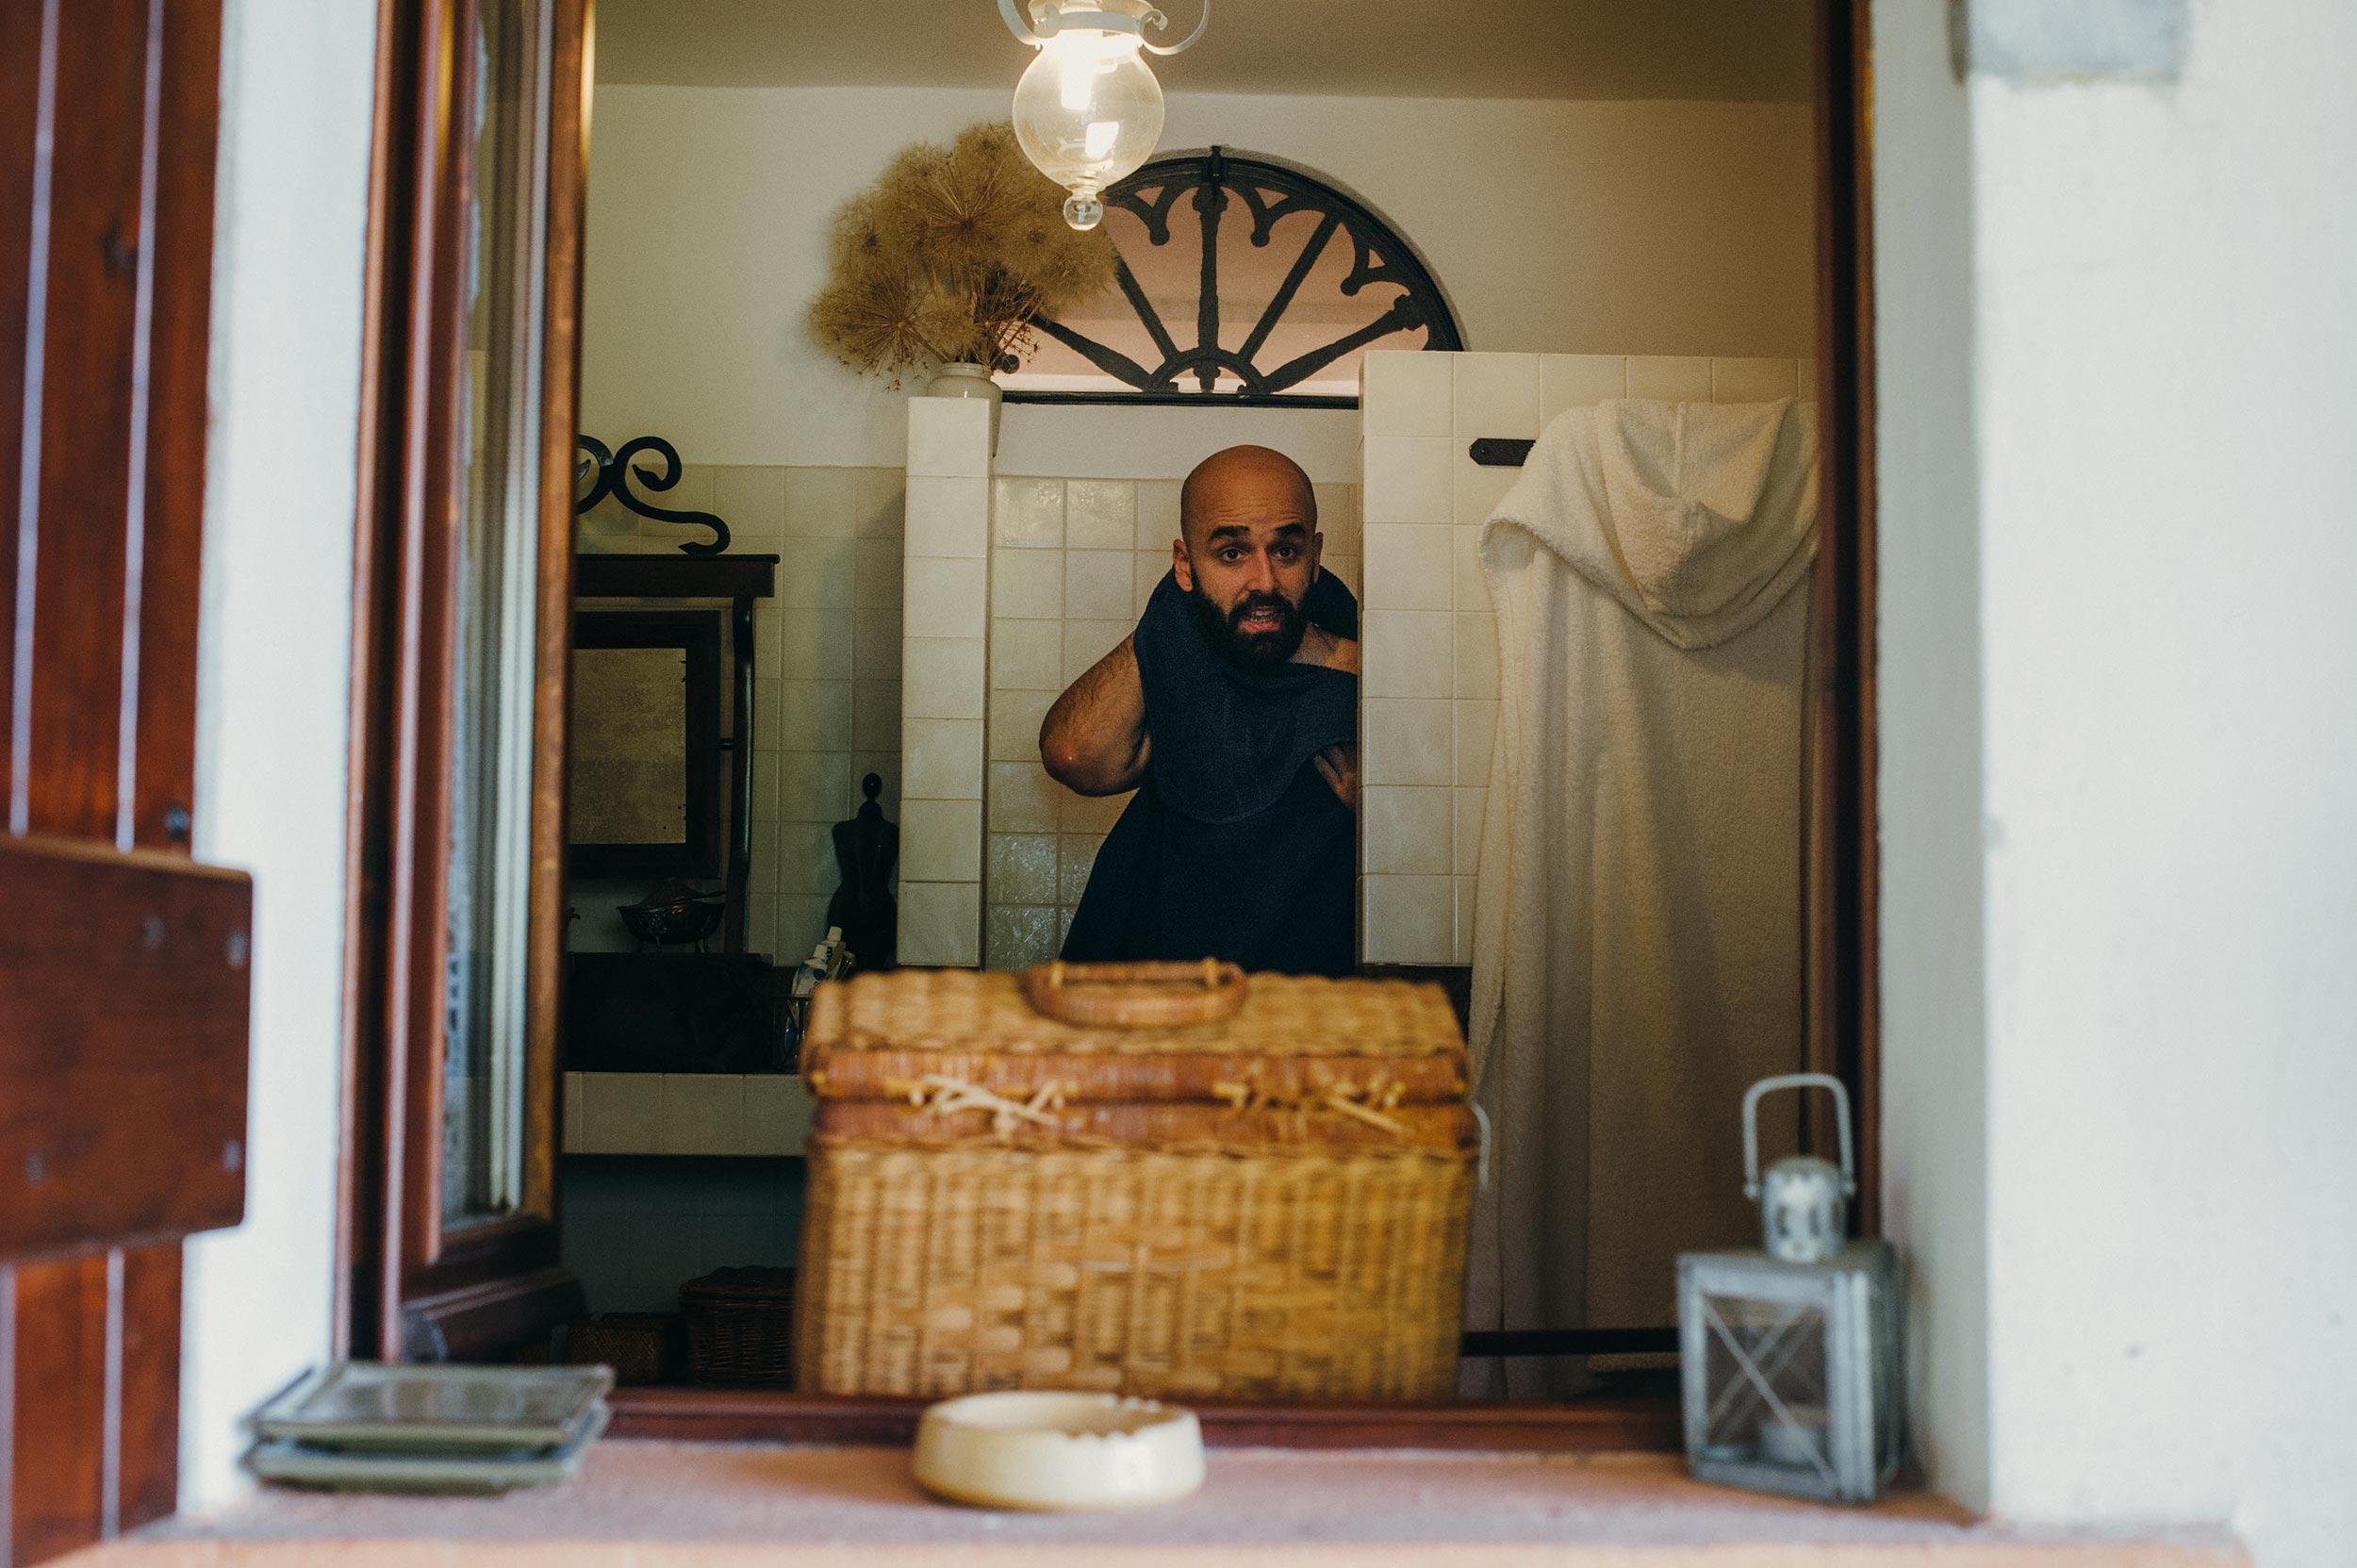 2016-Davor-Chiara-Monferrato-Asti-Vercelli-Wedding-Photographer-Italy-Alessandro-Avenali-8.jpg